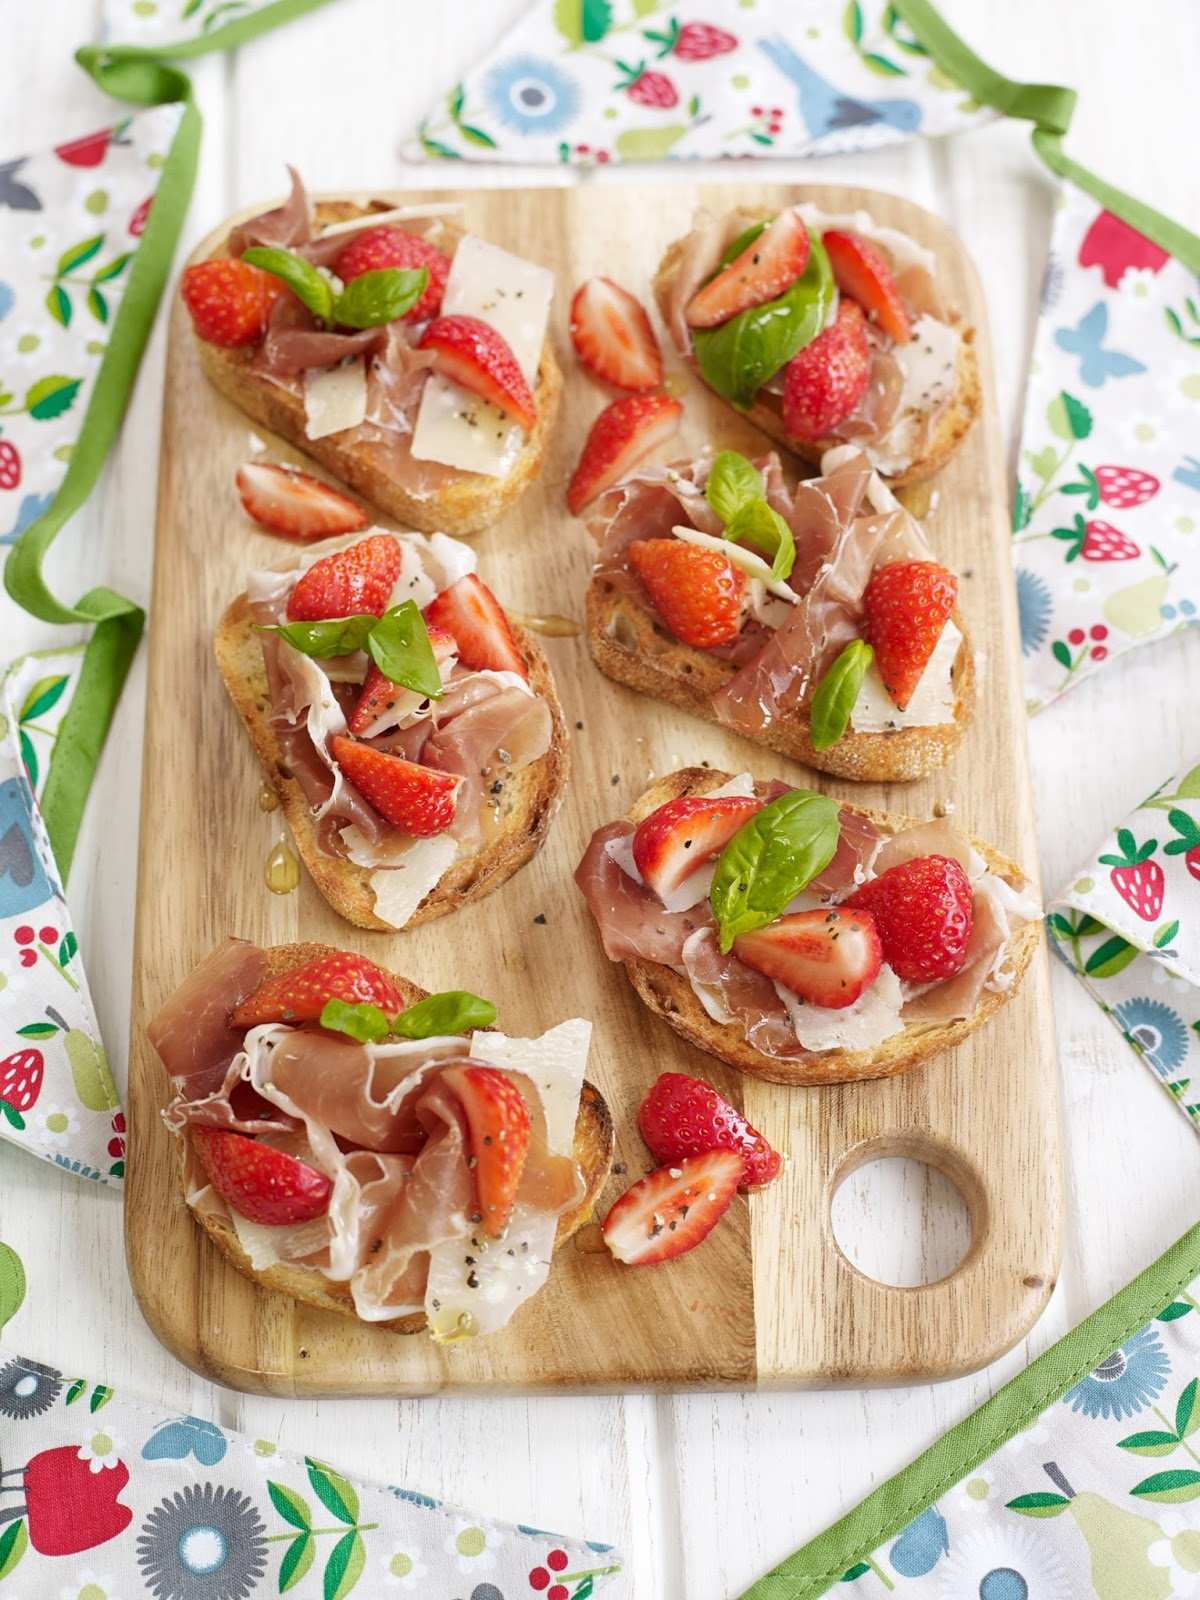 BerryWorld Strawberry Parma Ham and Parmesan Crostini